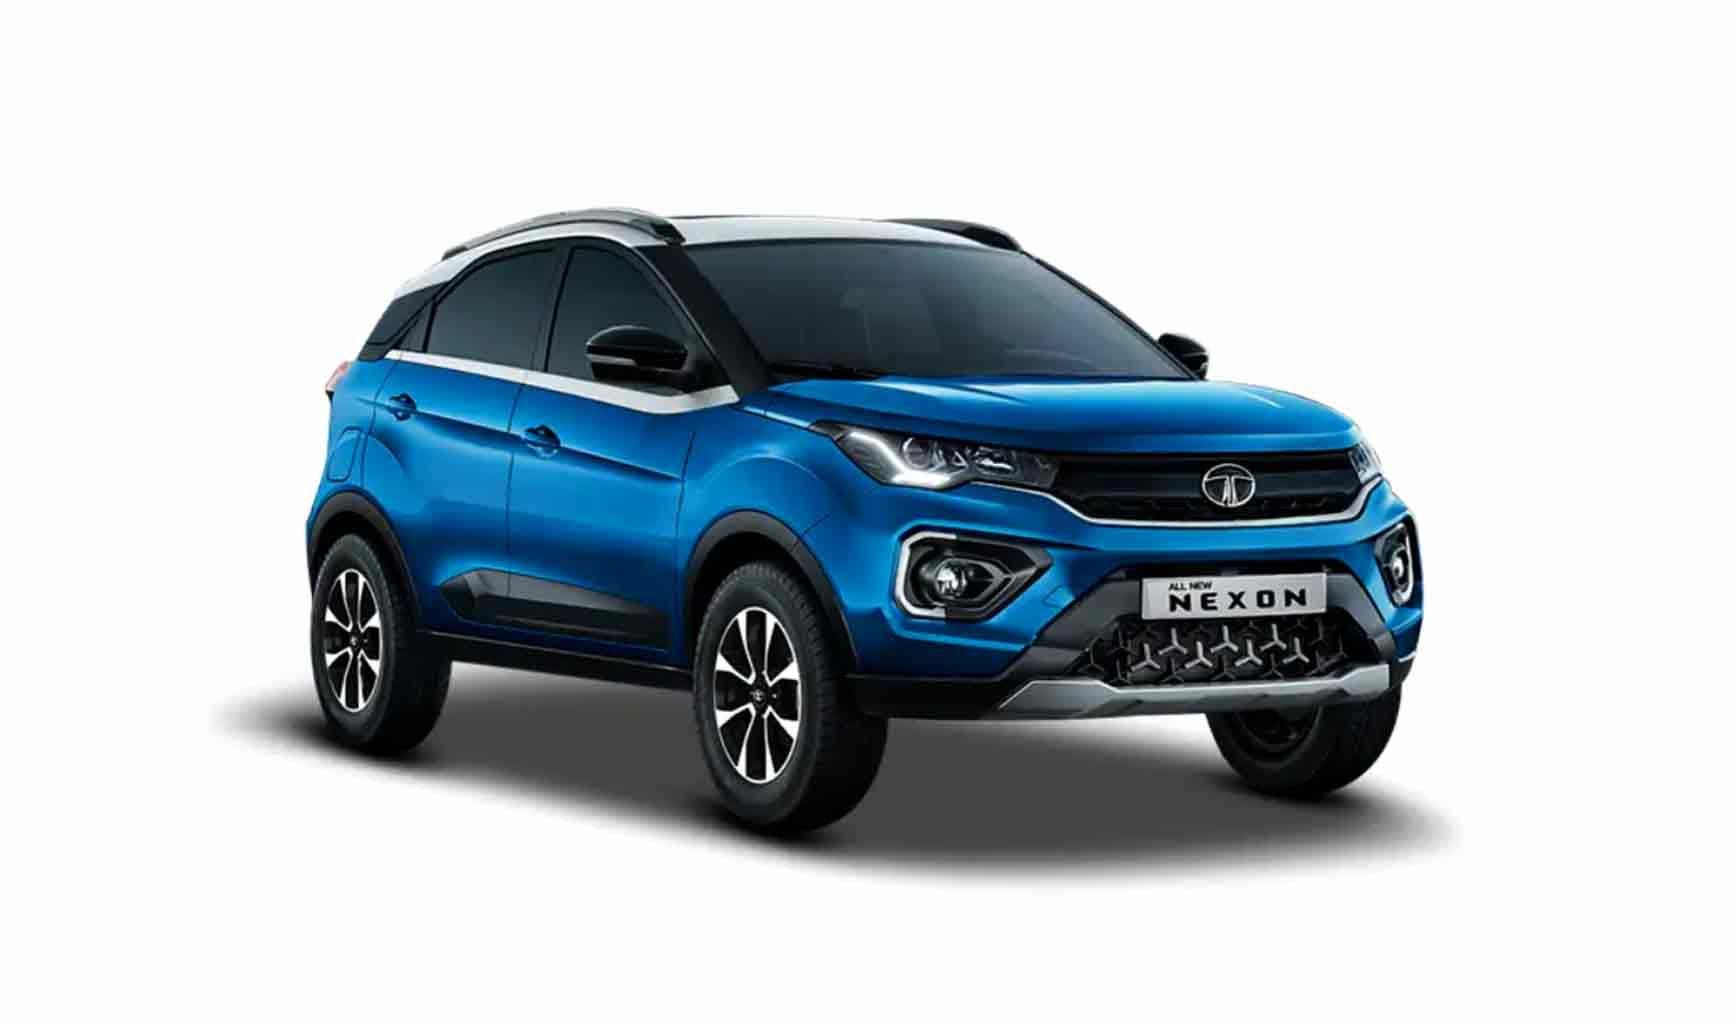 Tata Nexon 14 Variants in 2020 Tata, Car, New cars